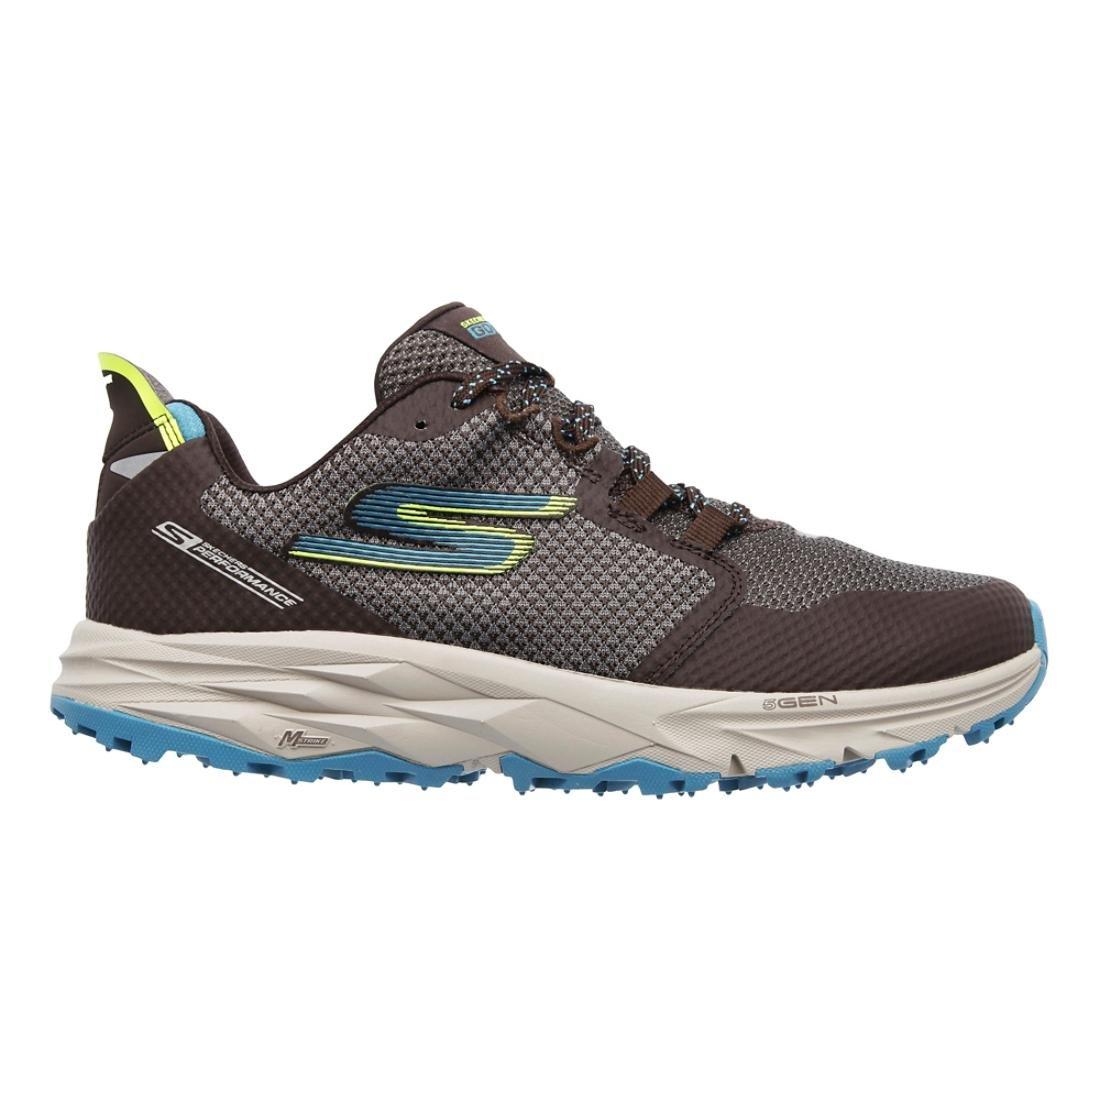 Skechers Womens Go Trail 2 B06X18RJYY 9.5 B(M) US|Chocolate/Blue